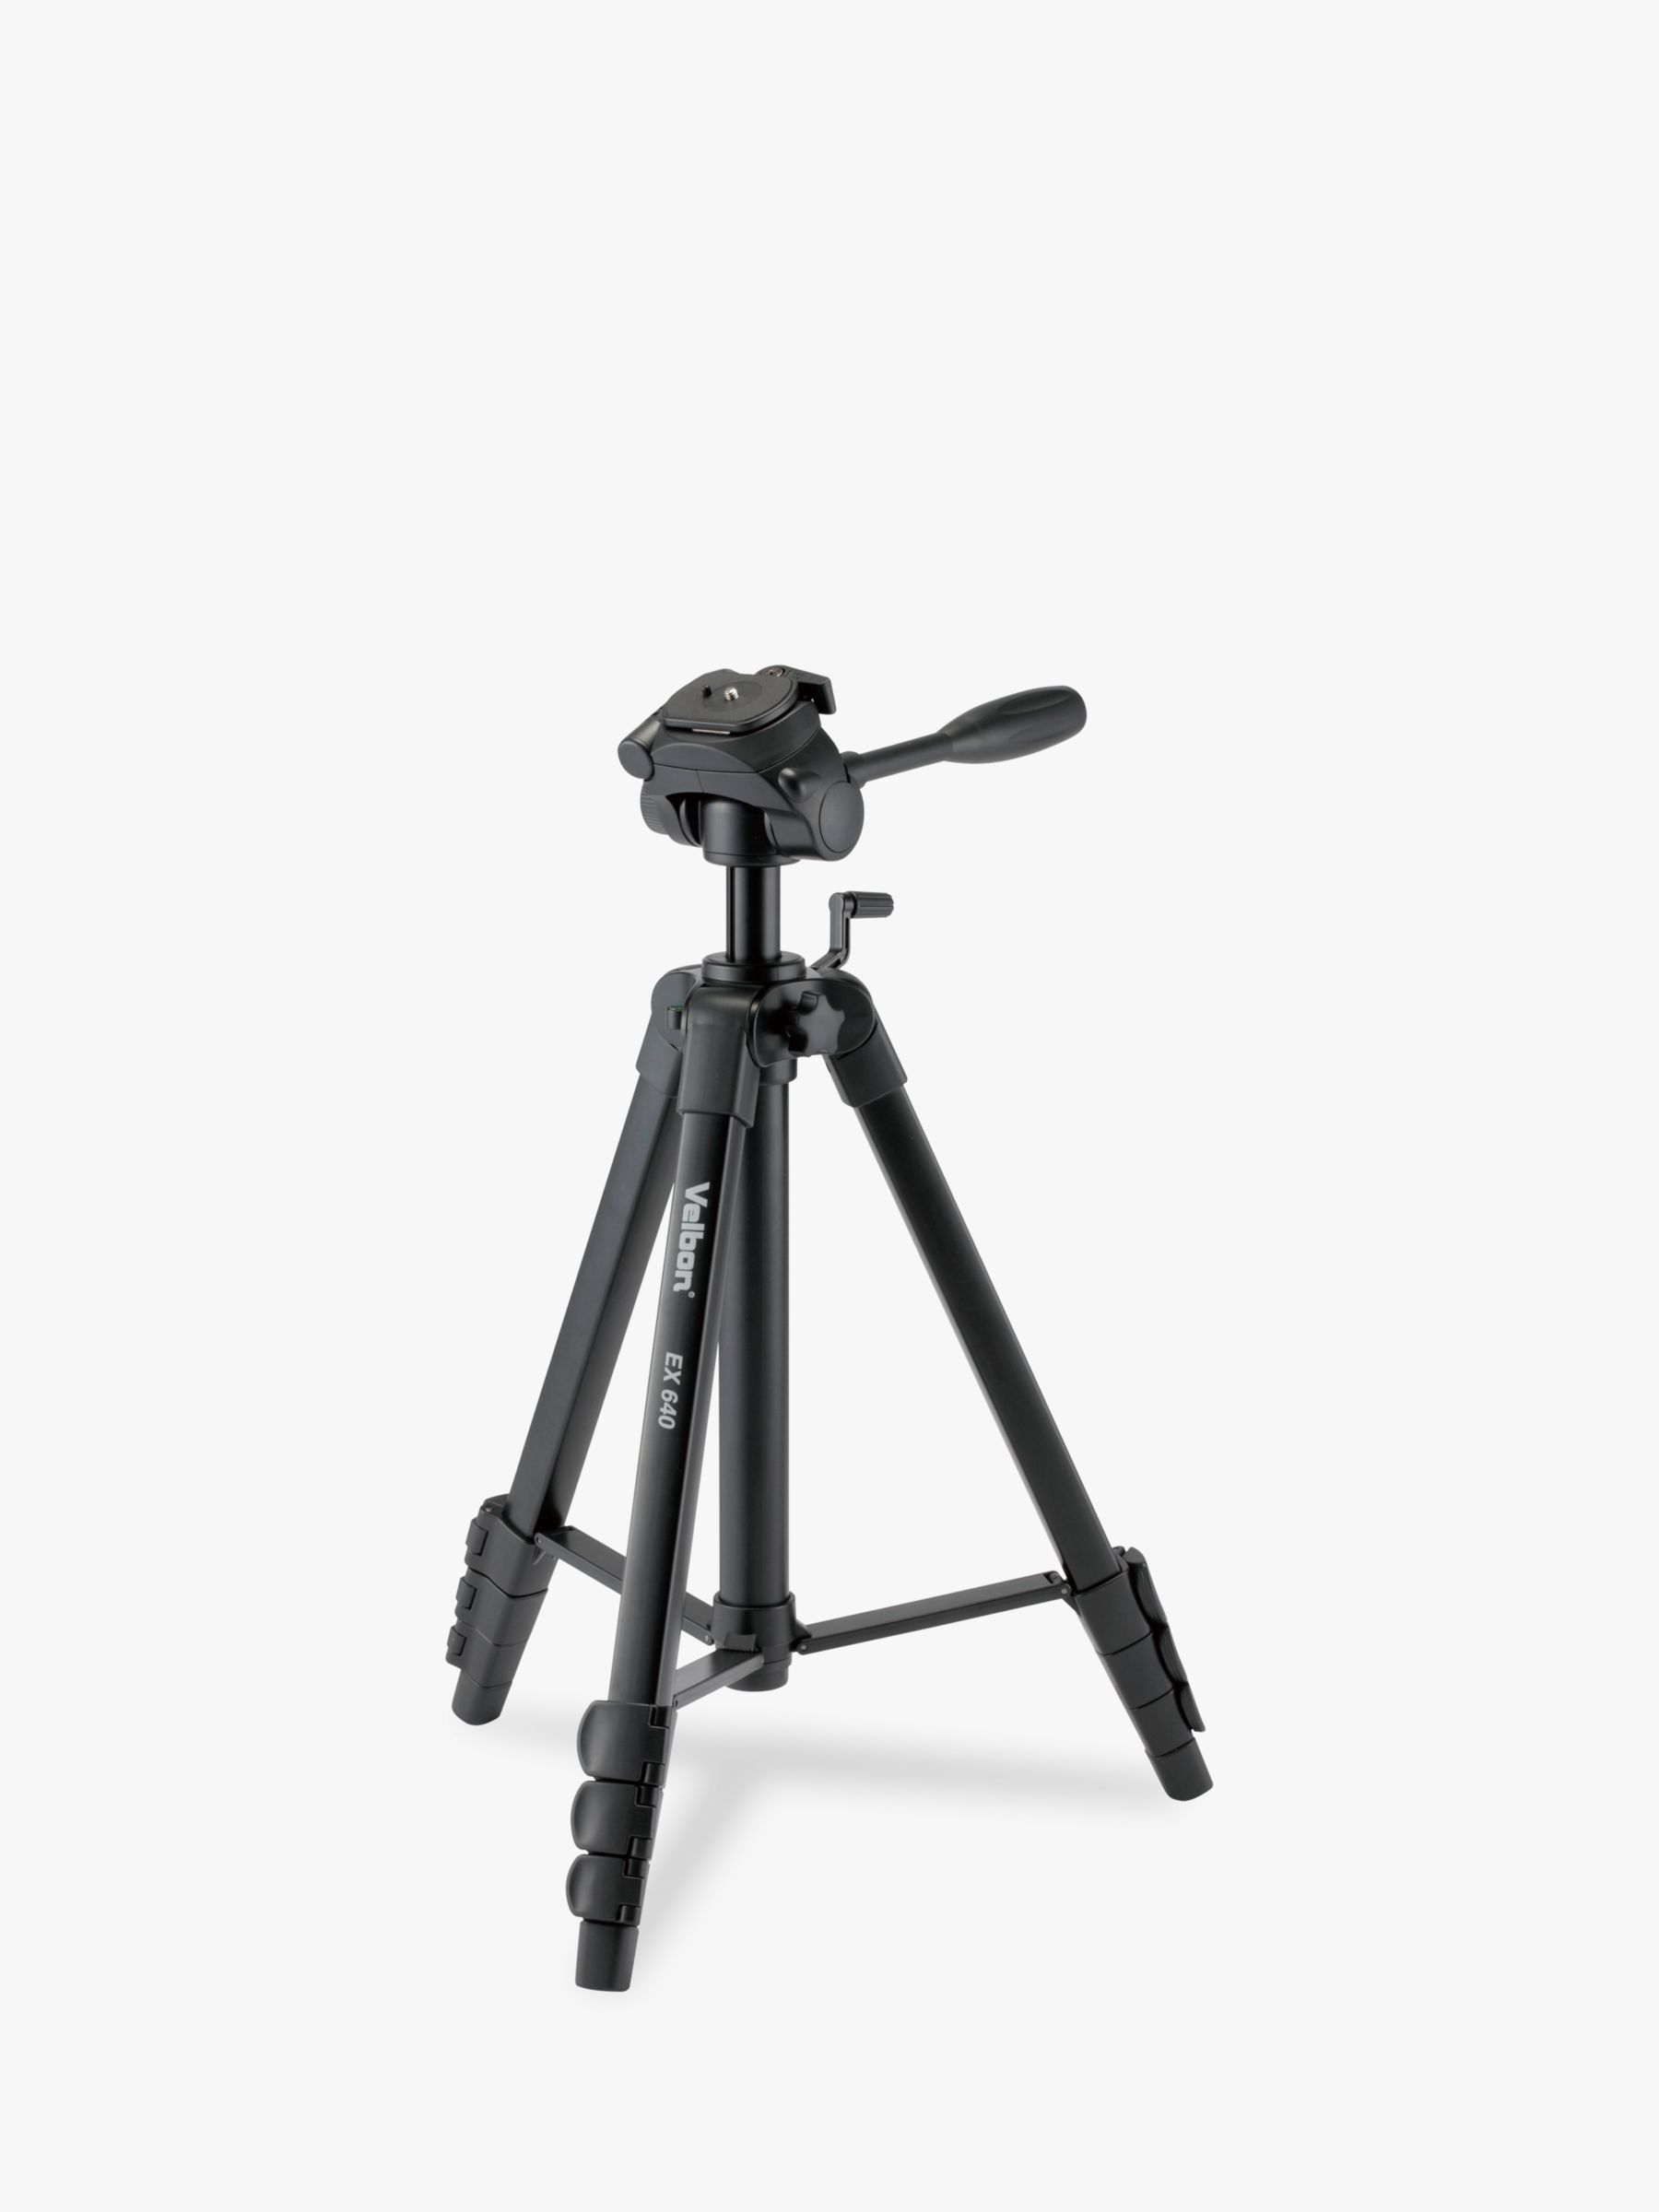 Velbon Velbon EX-640 Tripod, Black